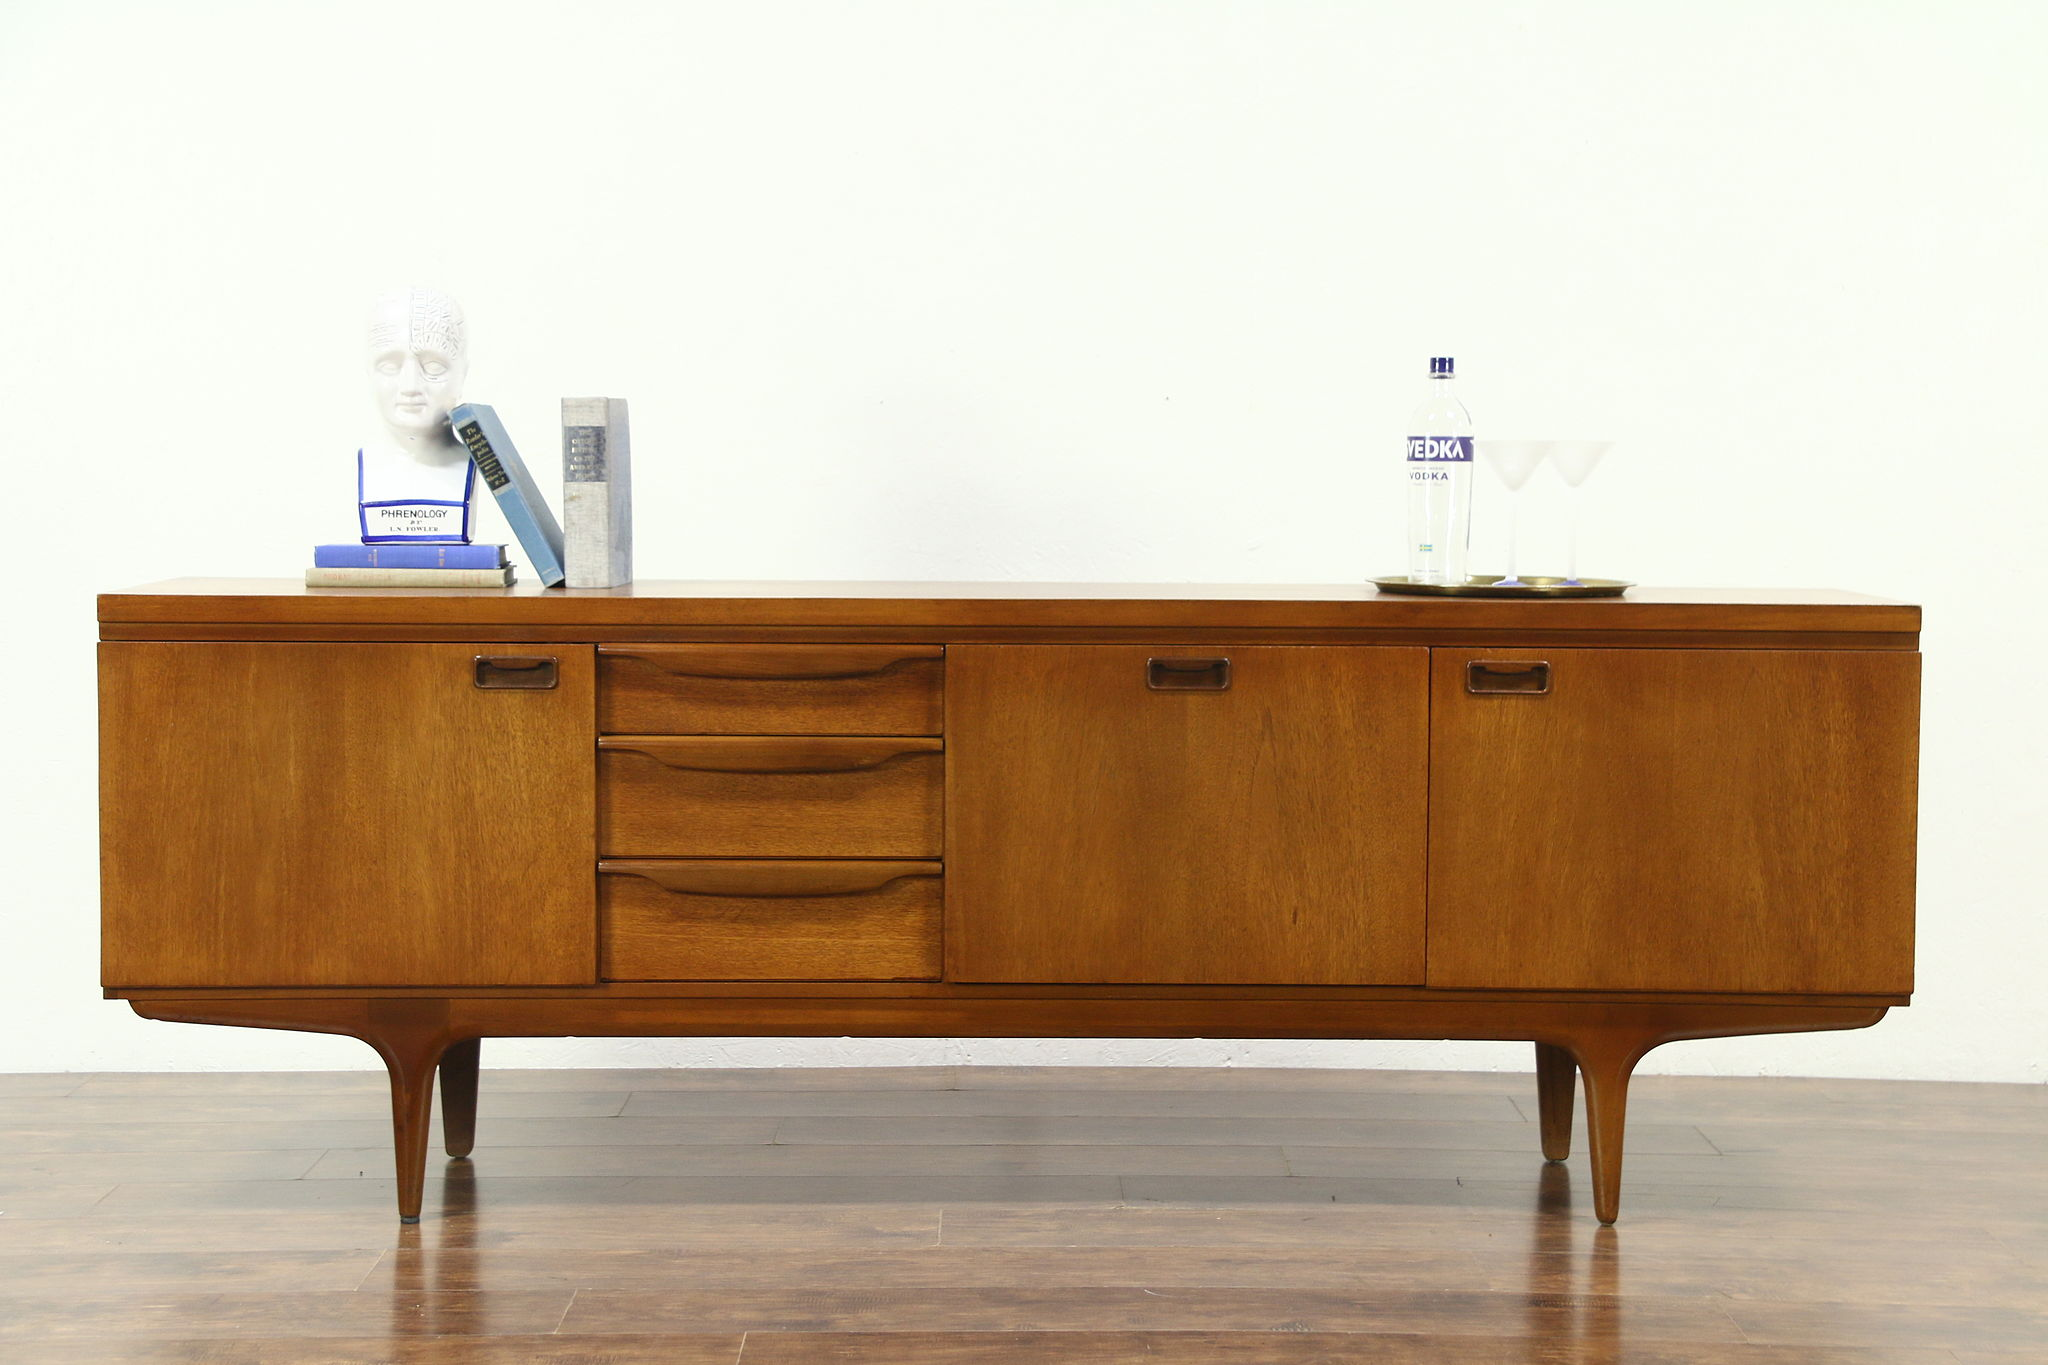 merton cabinet img mid by gershun century products urbanamericana bar